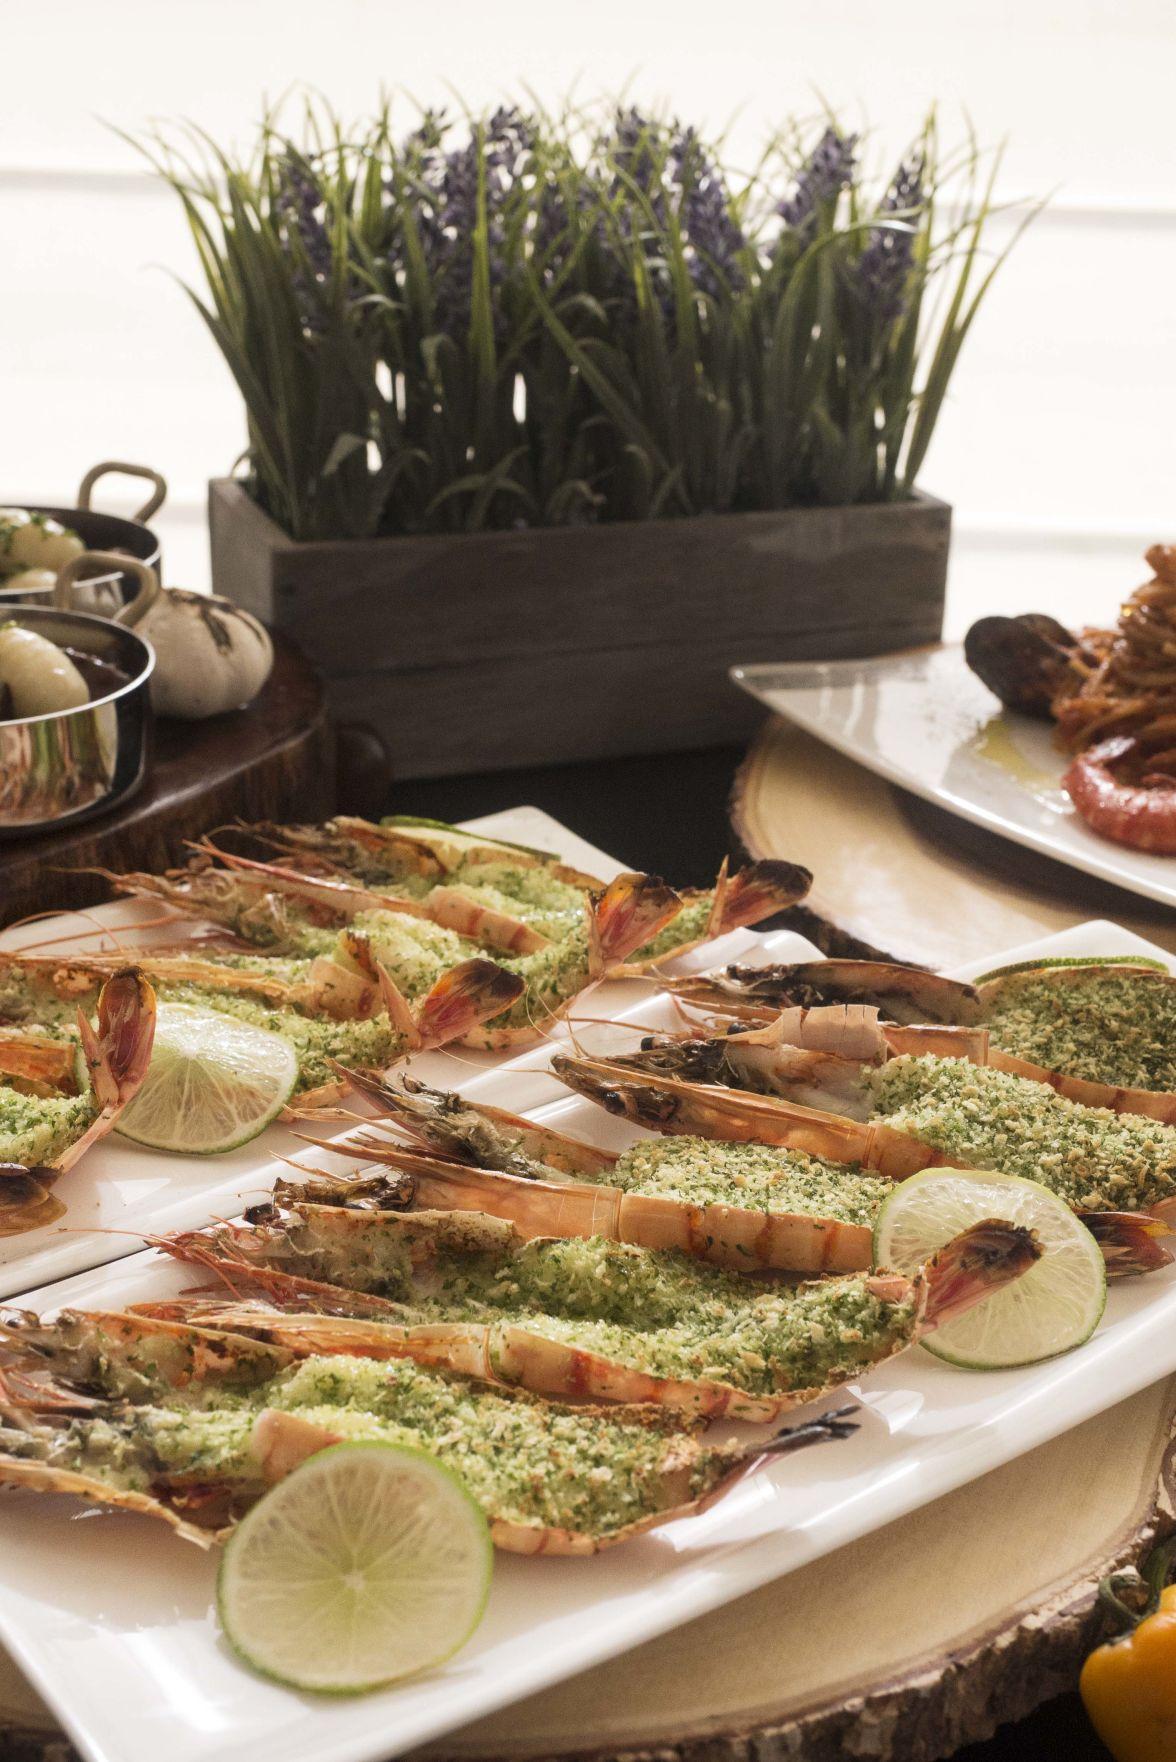 Prime rib headlines international buffets at Magellan